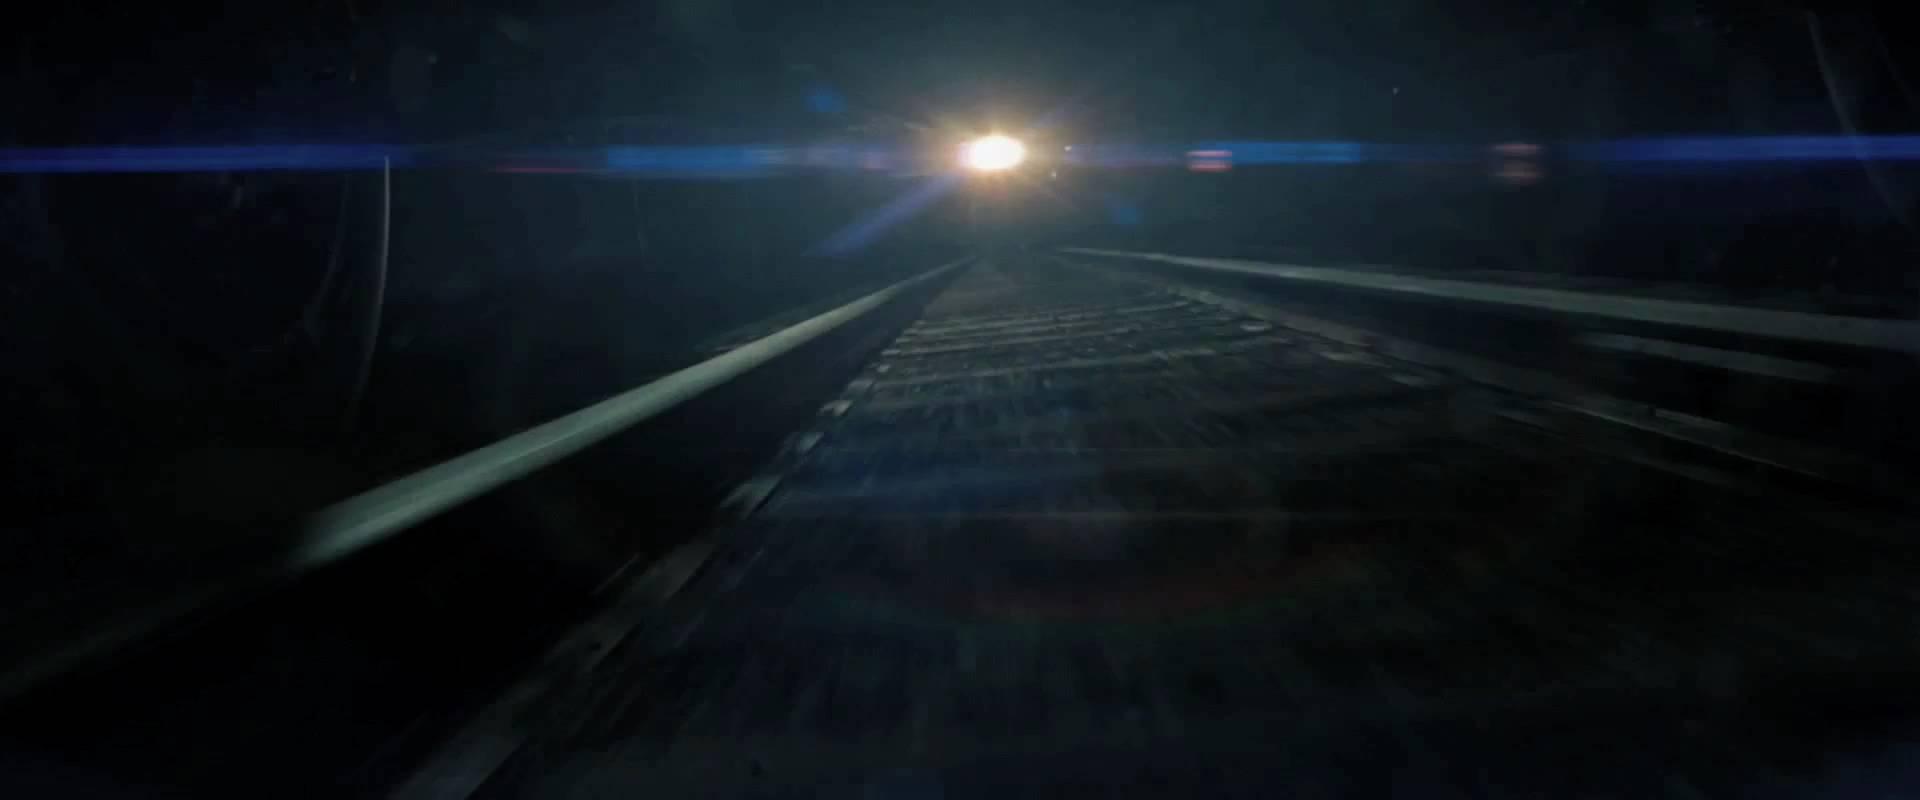 J.J. Abrams Super 8 OFFICIAL [HD] | Trailer #1 (2011) J.J. Abrams, Steven Spielberg